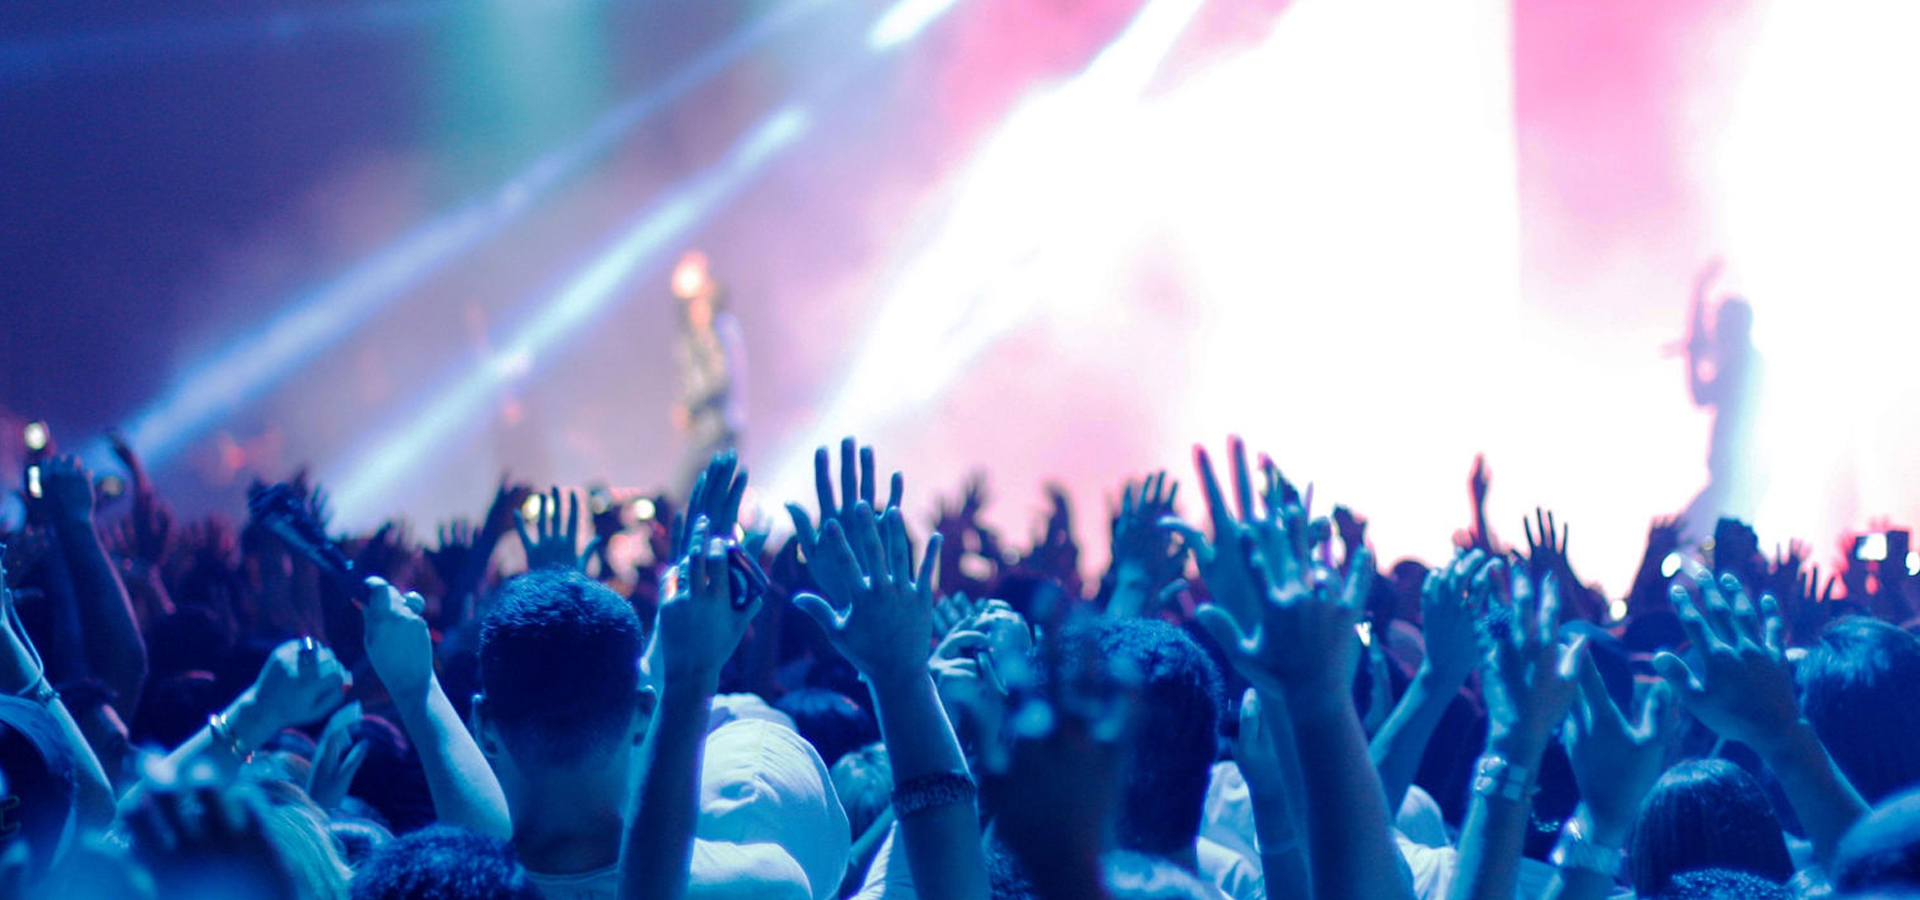 concerts background  concert  hand  crowd background image